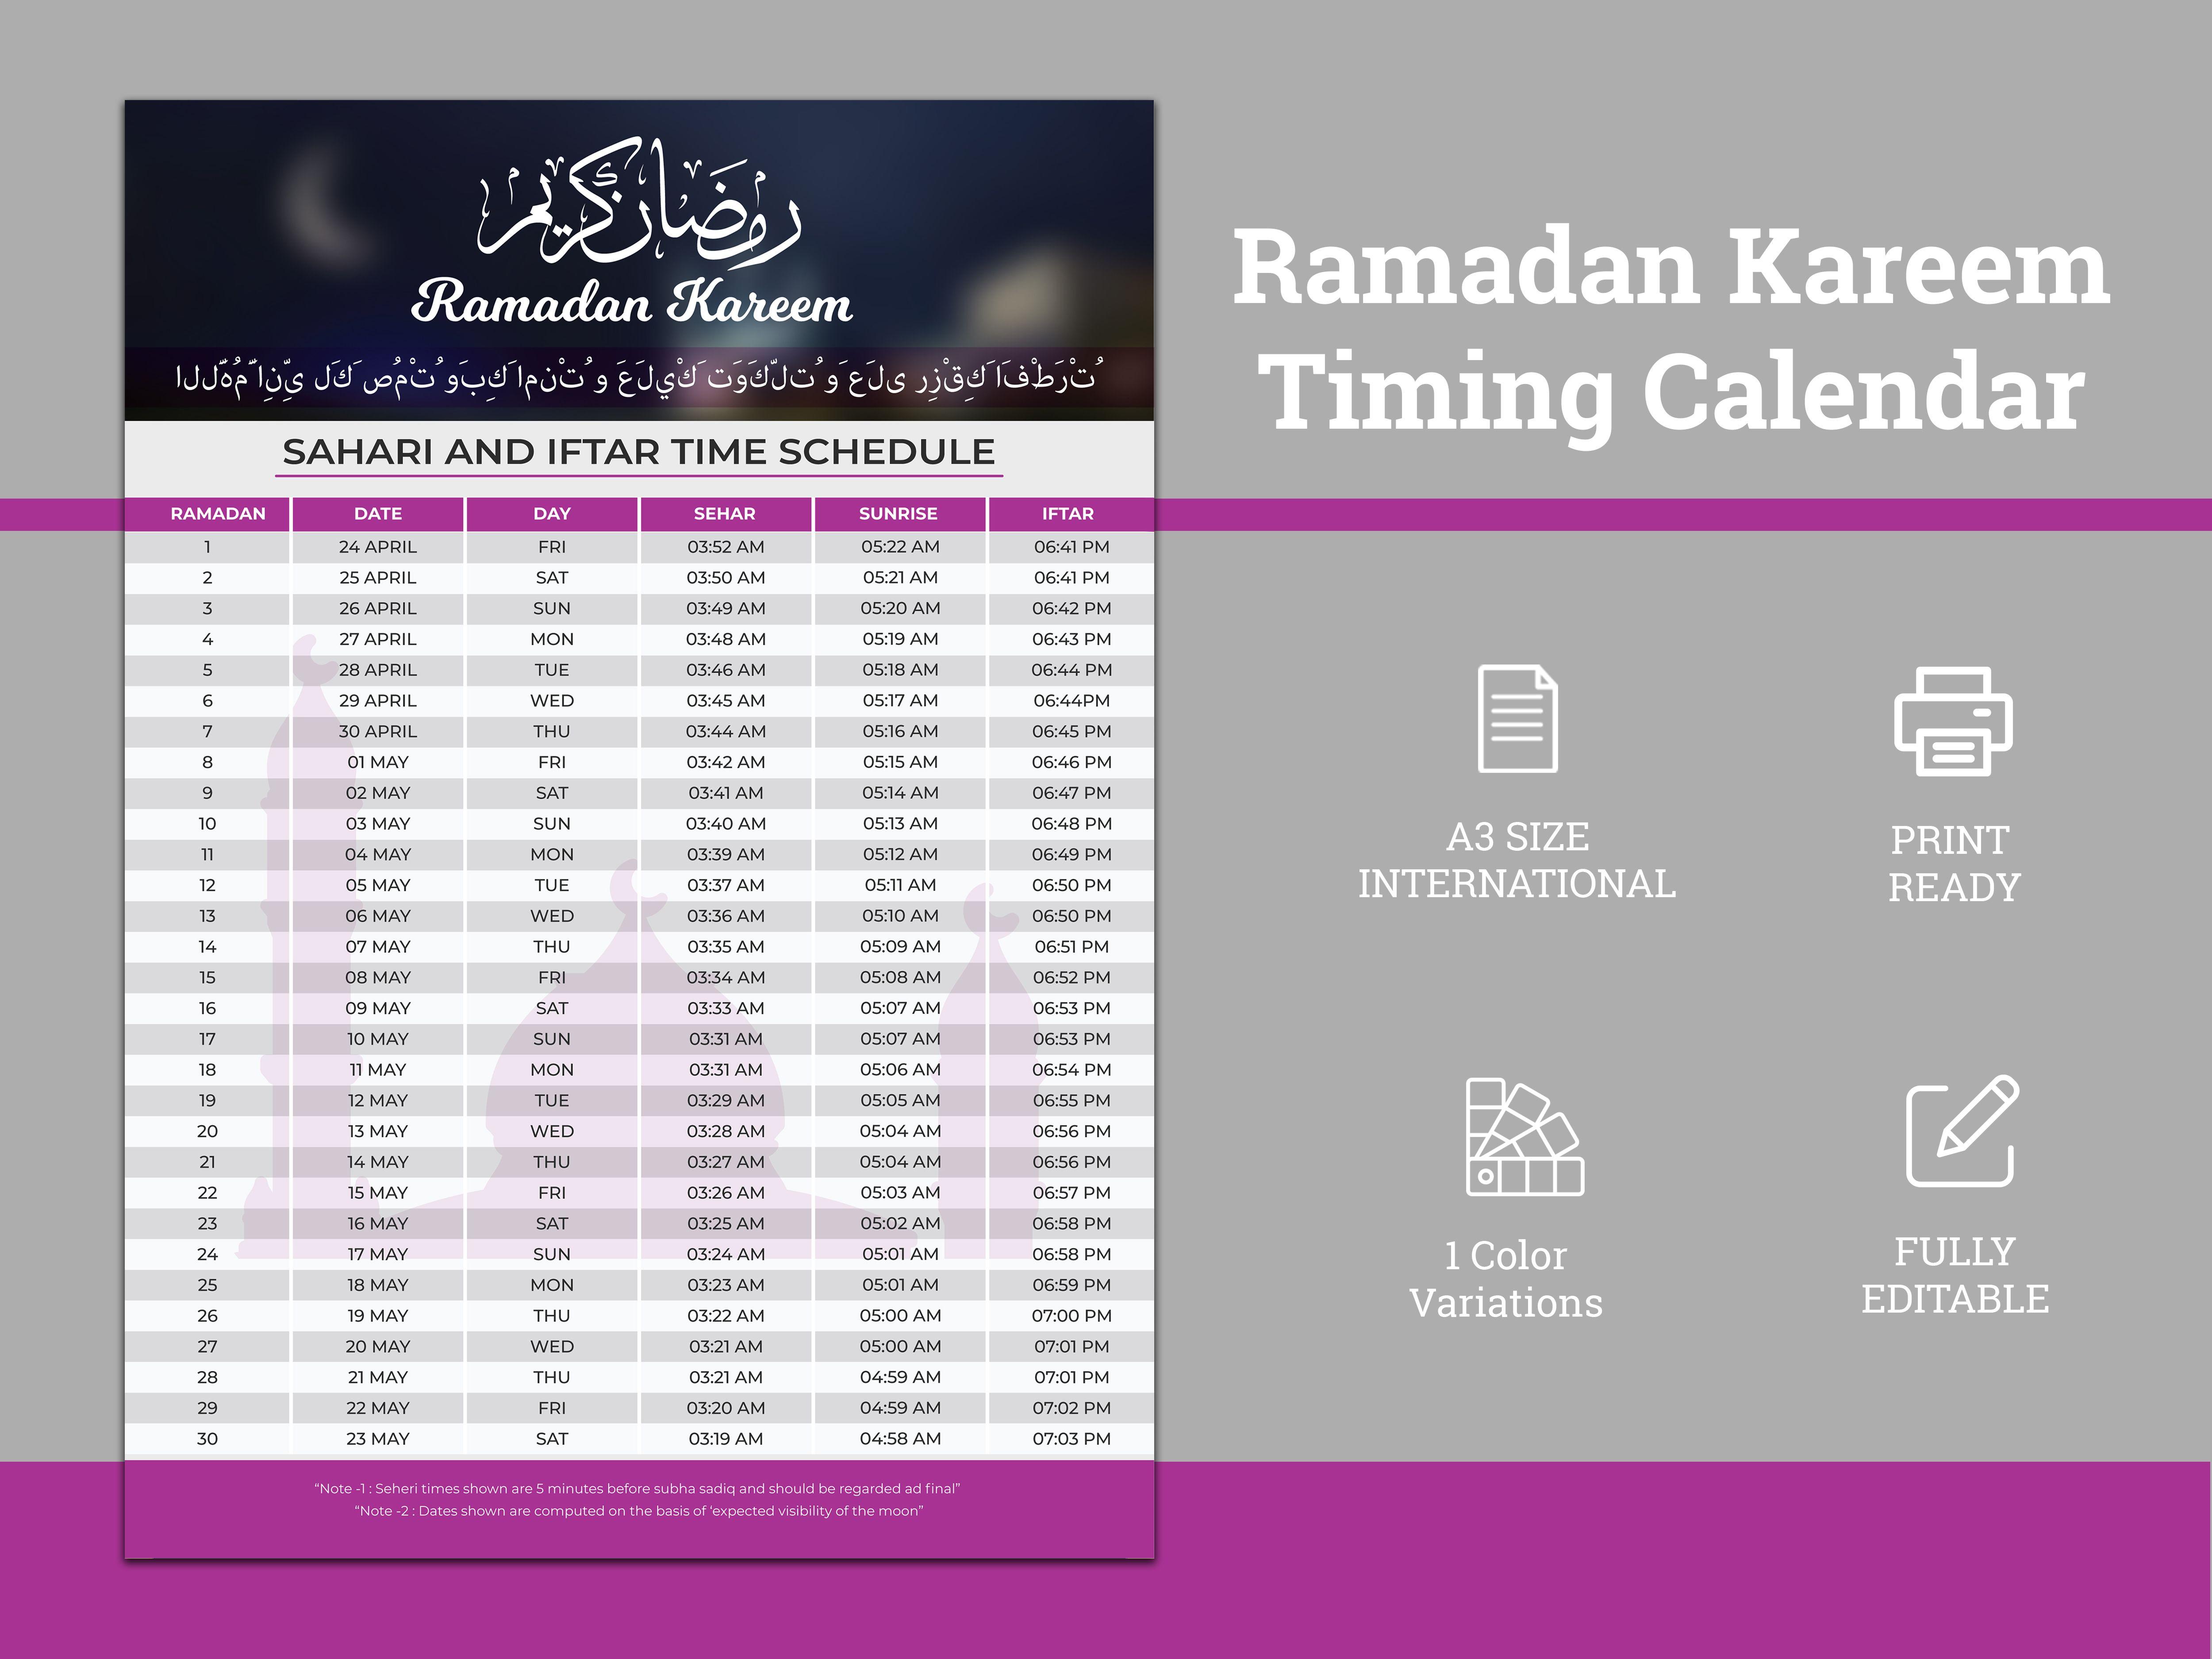 Ramadan Kareem Timing 2021 Calendar, Iftar & Sheri,Iftar ...